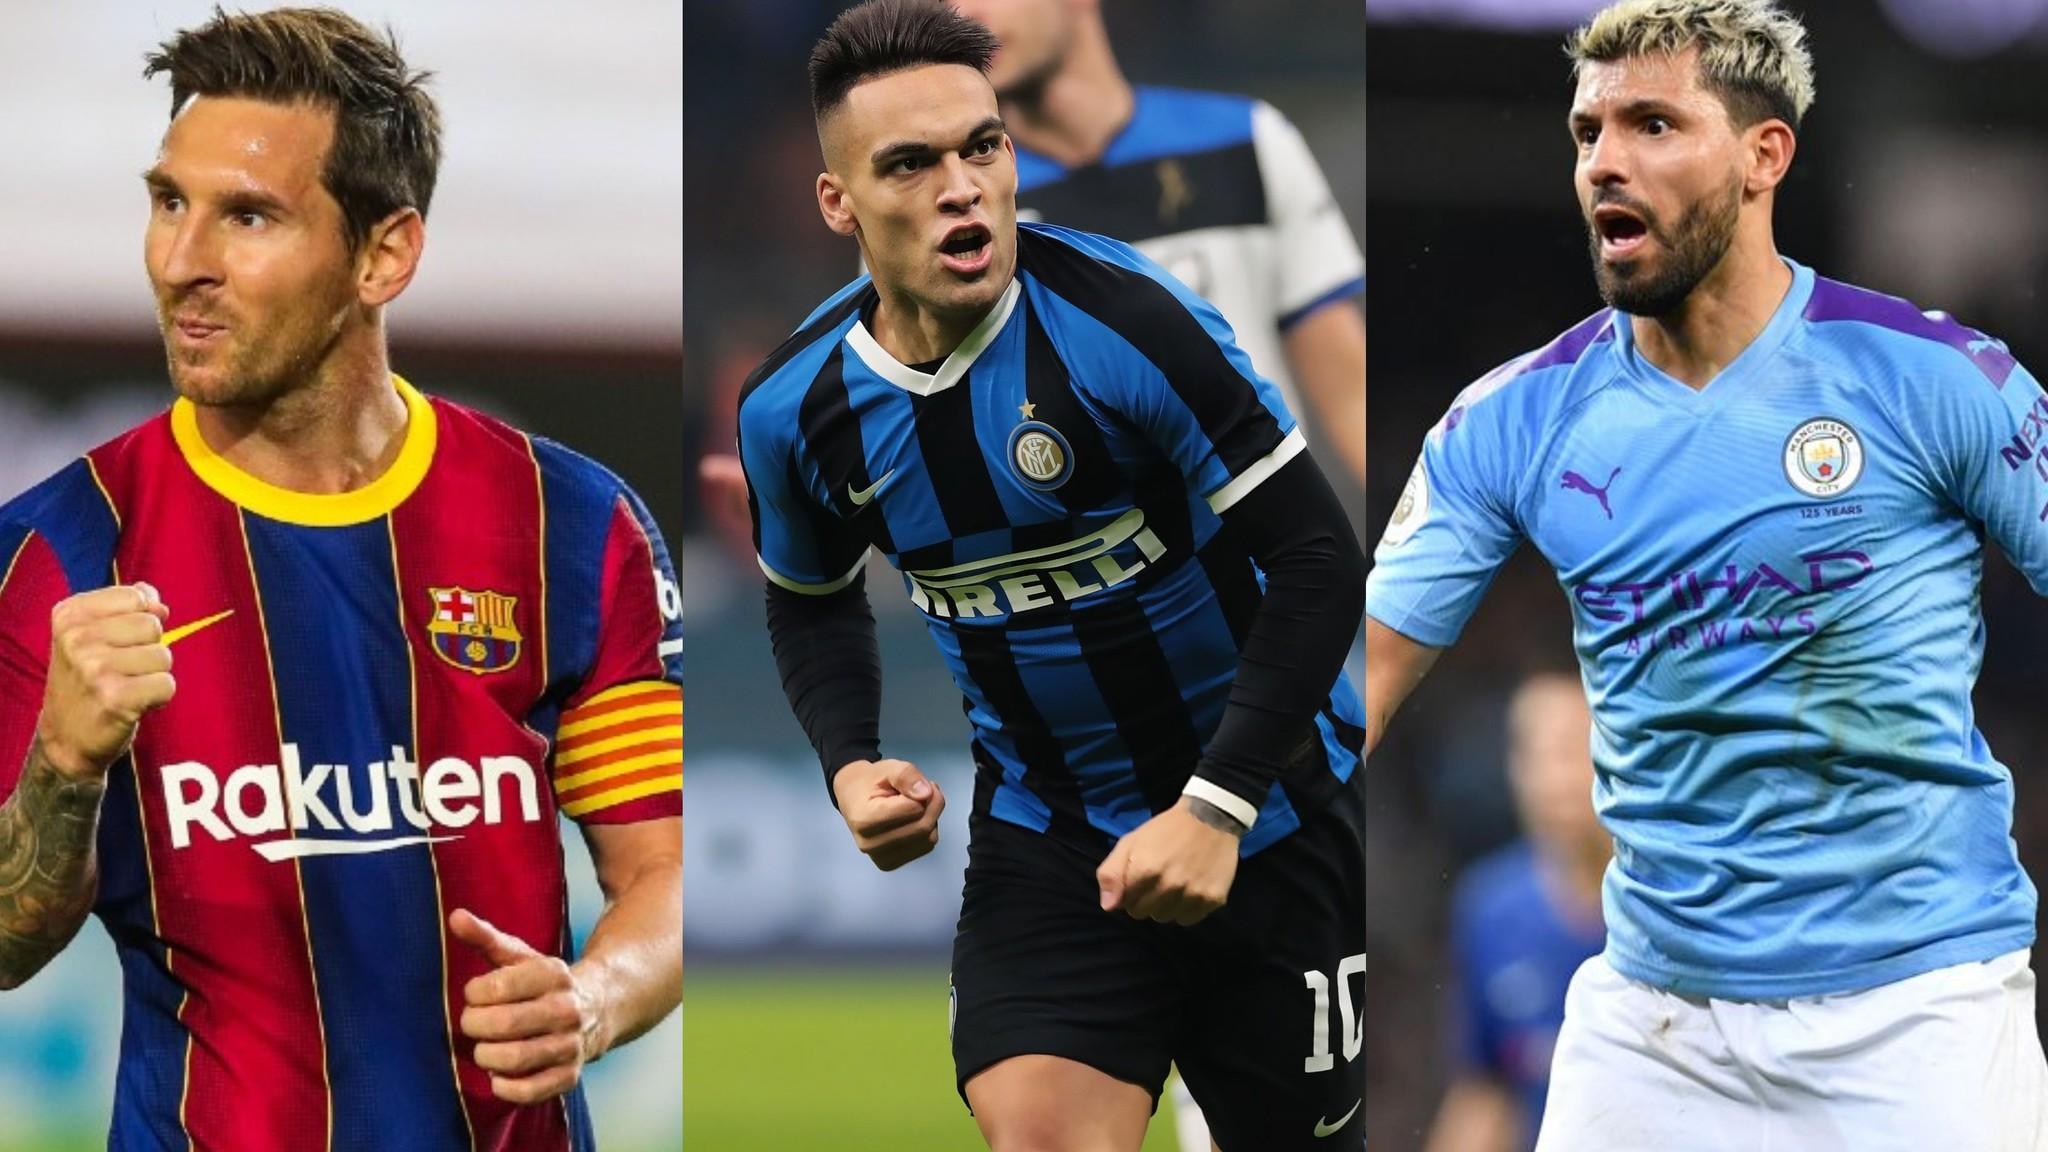 Messi, Lautaro y Agüero empezaron con triunfos.